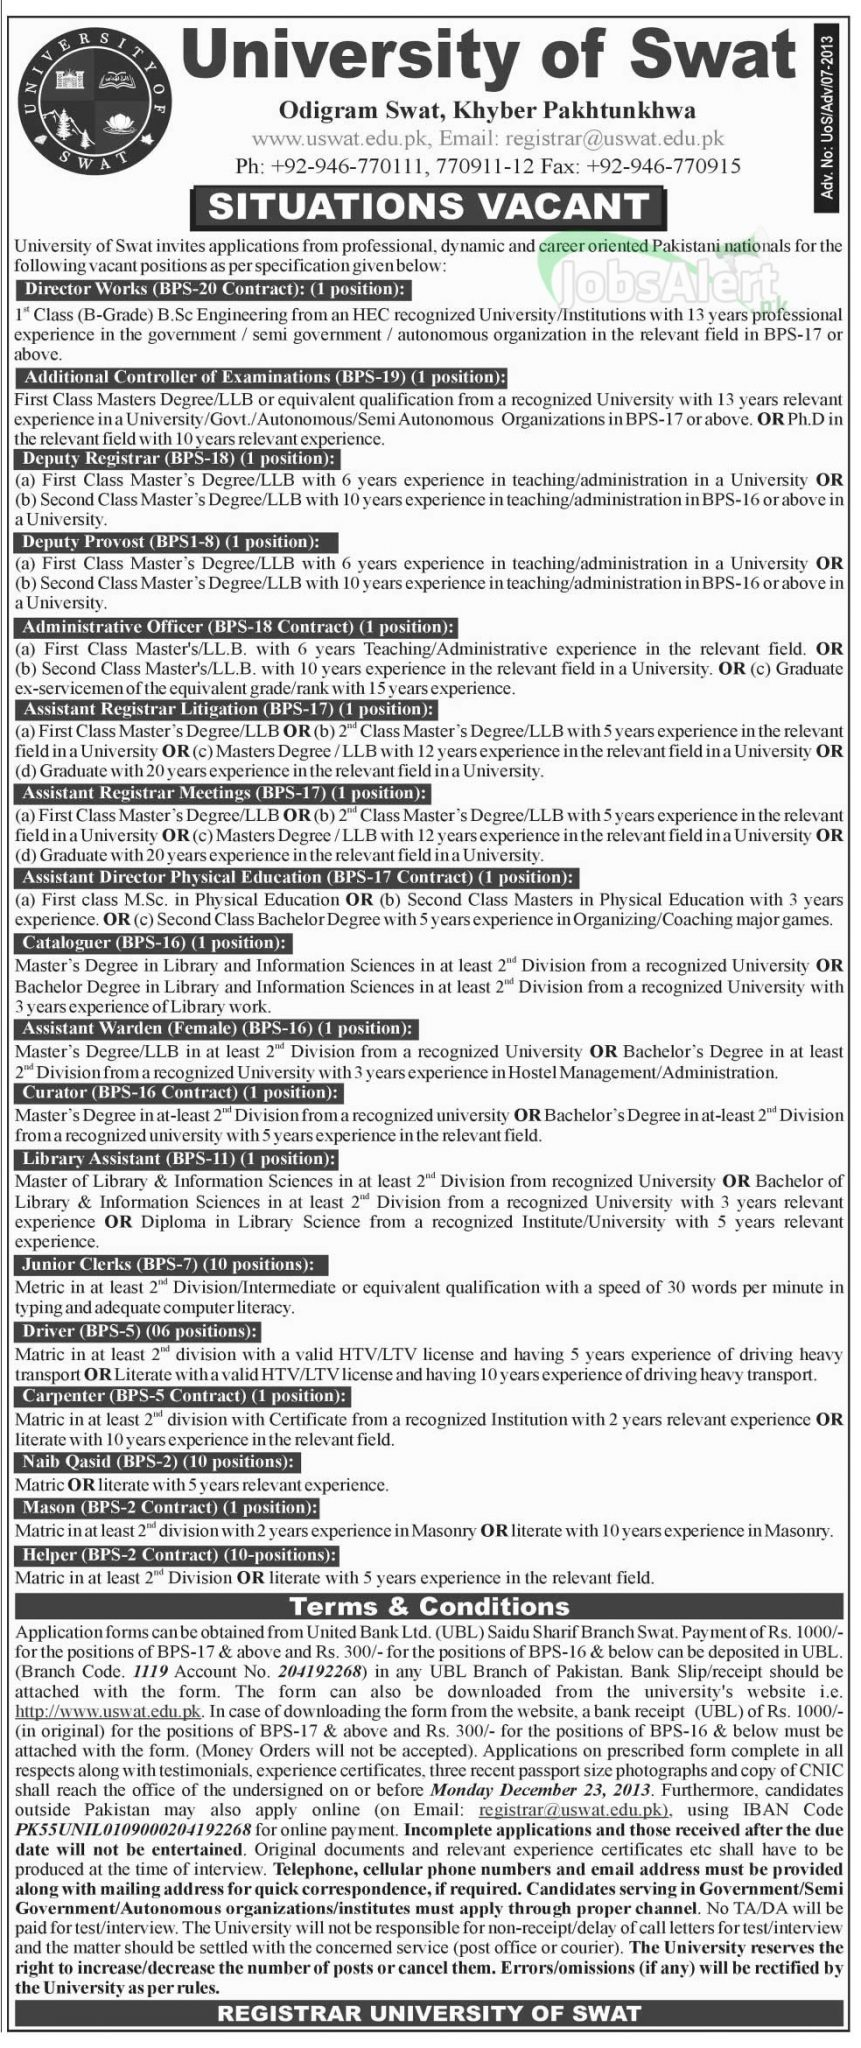 Director & Deputy Registrar Jobs in University of Swat KPK